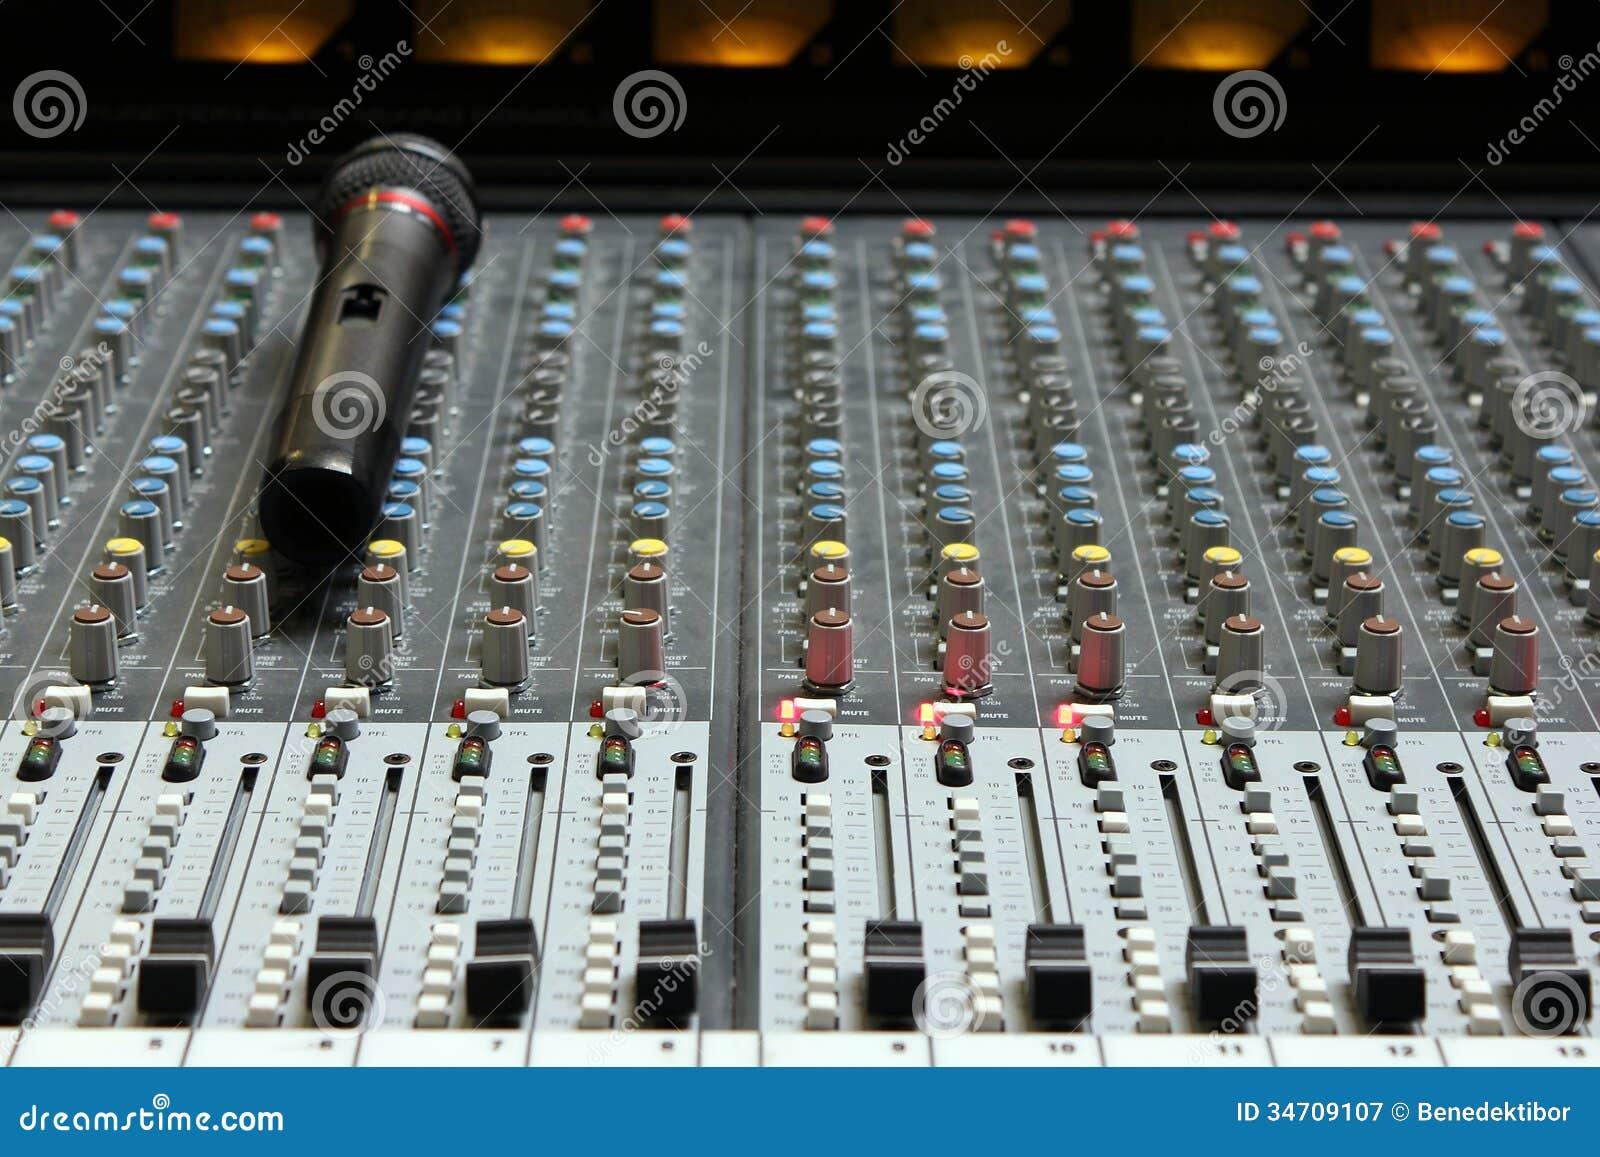 Misturador sadio audio com microfone